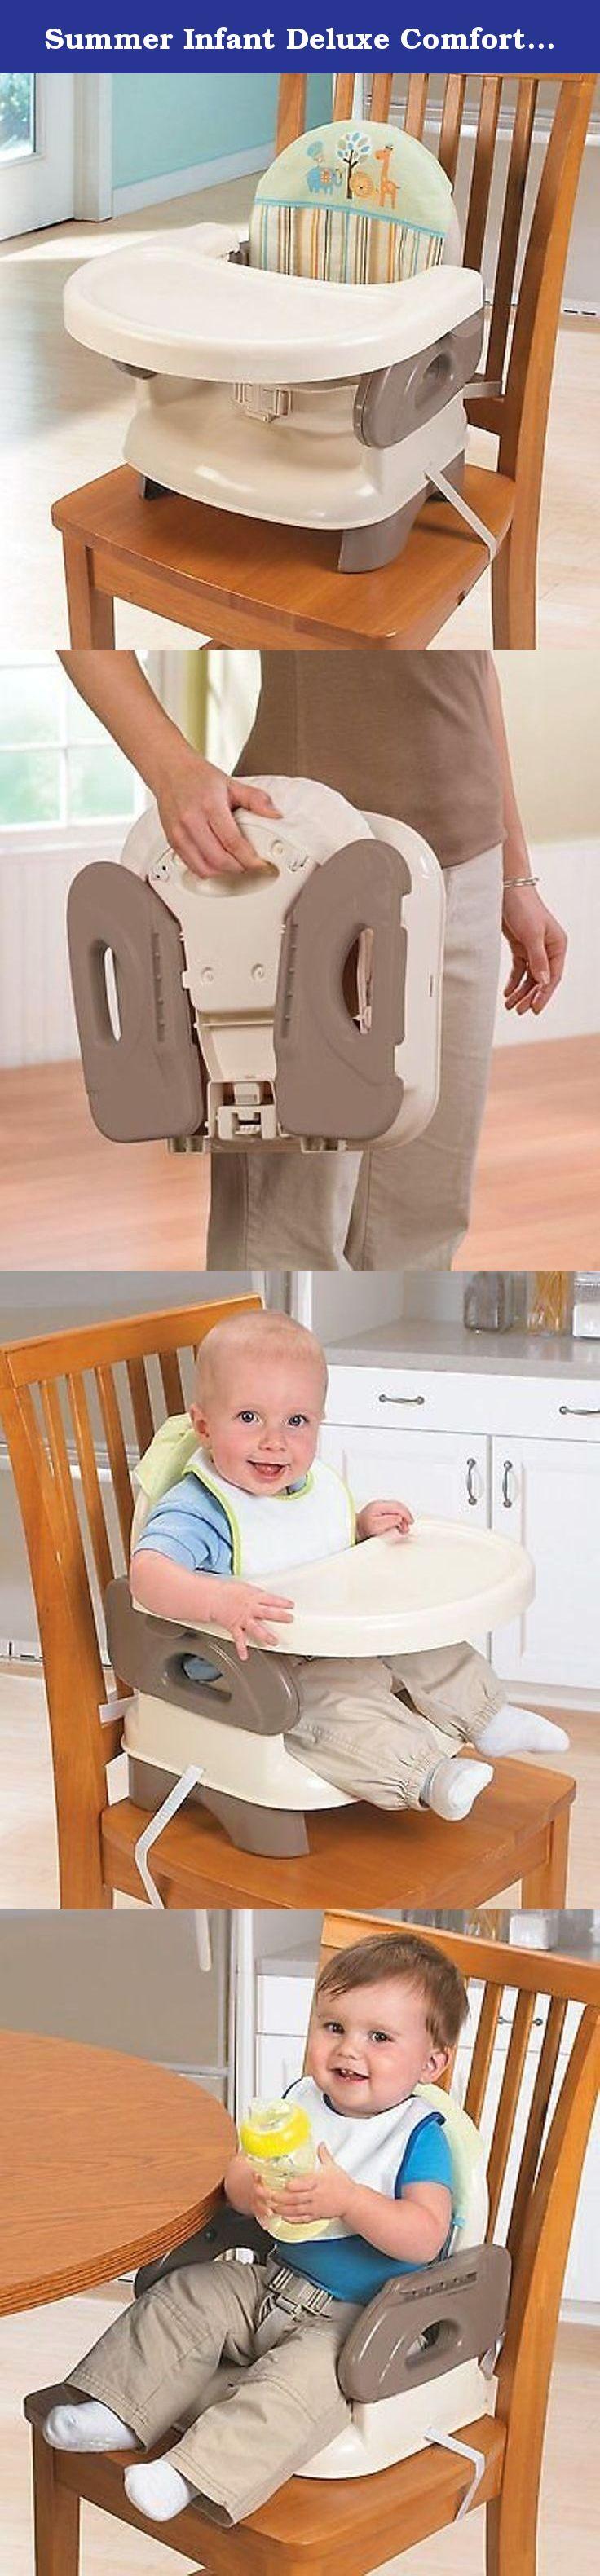 Stupendous Summer Infant Deluxe Comfort Booster Seat Folding High Creativecarmelina Interior Chair Design Creativecarmelinacom